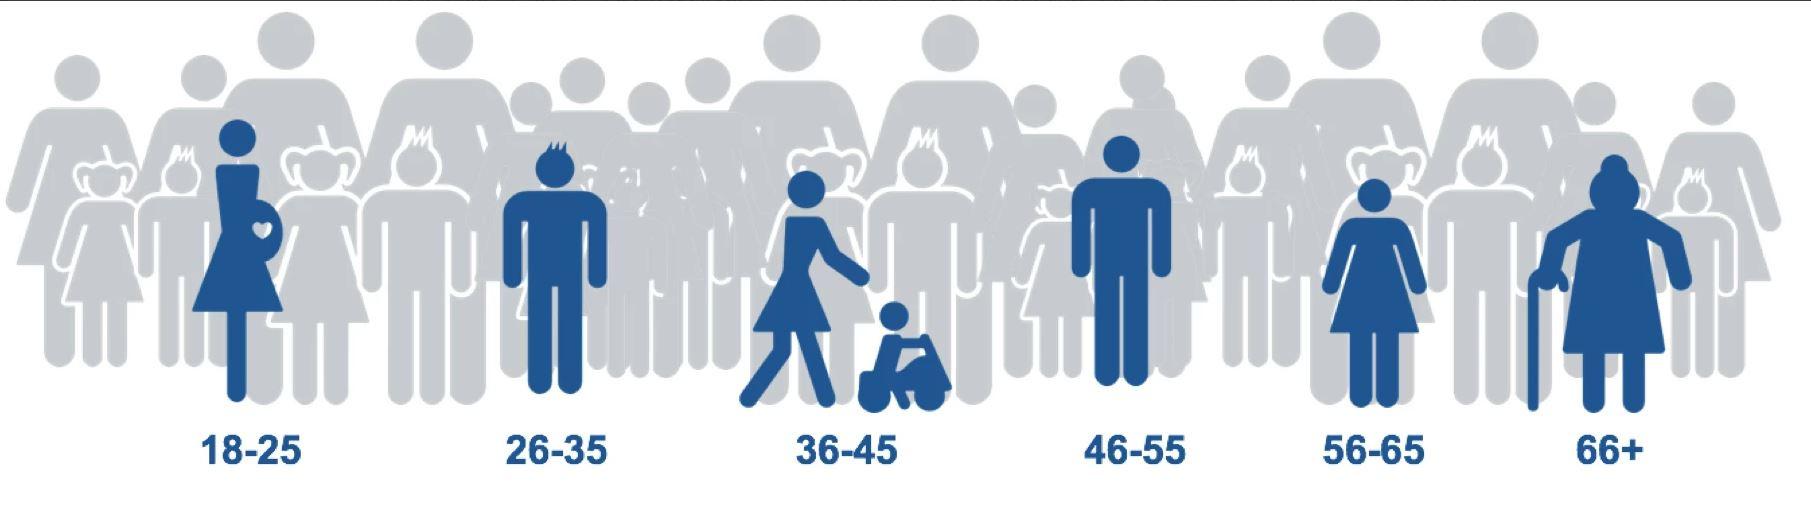 Geografi - Demografi - Interesser